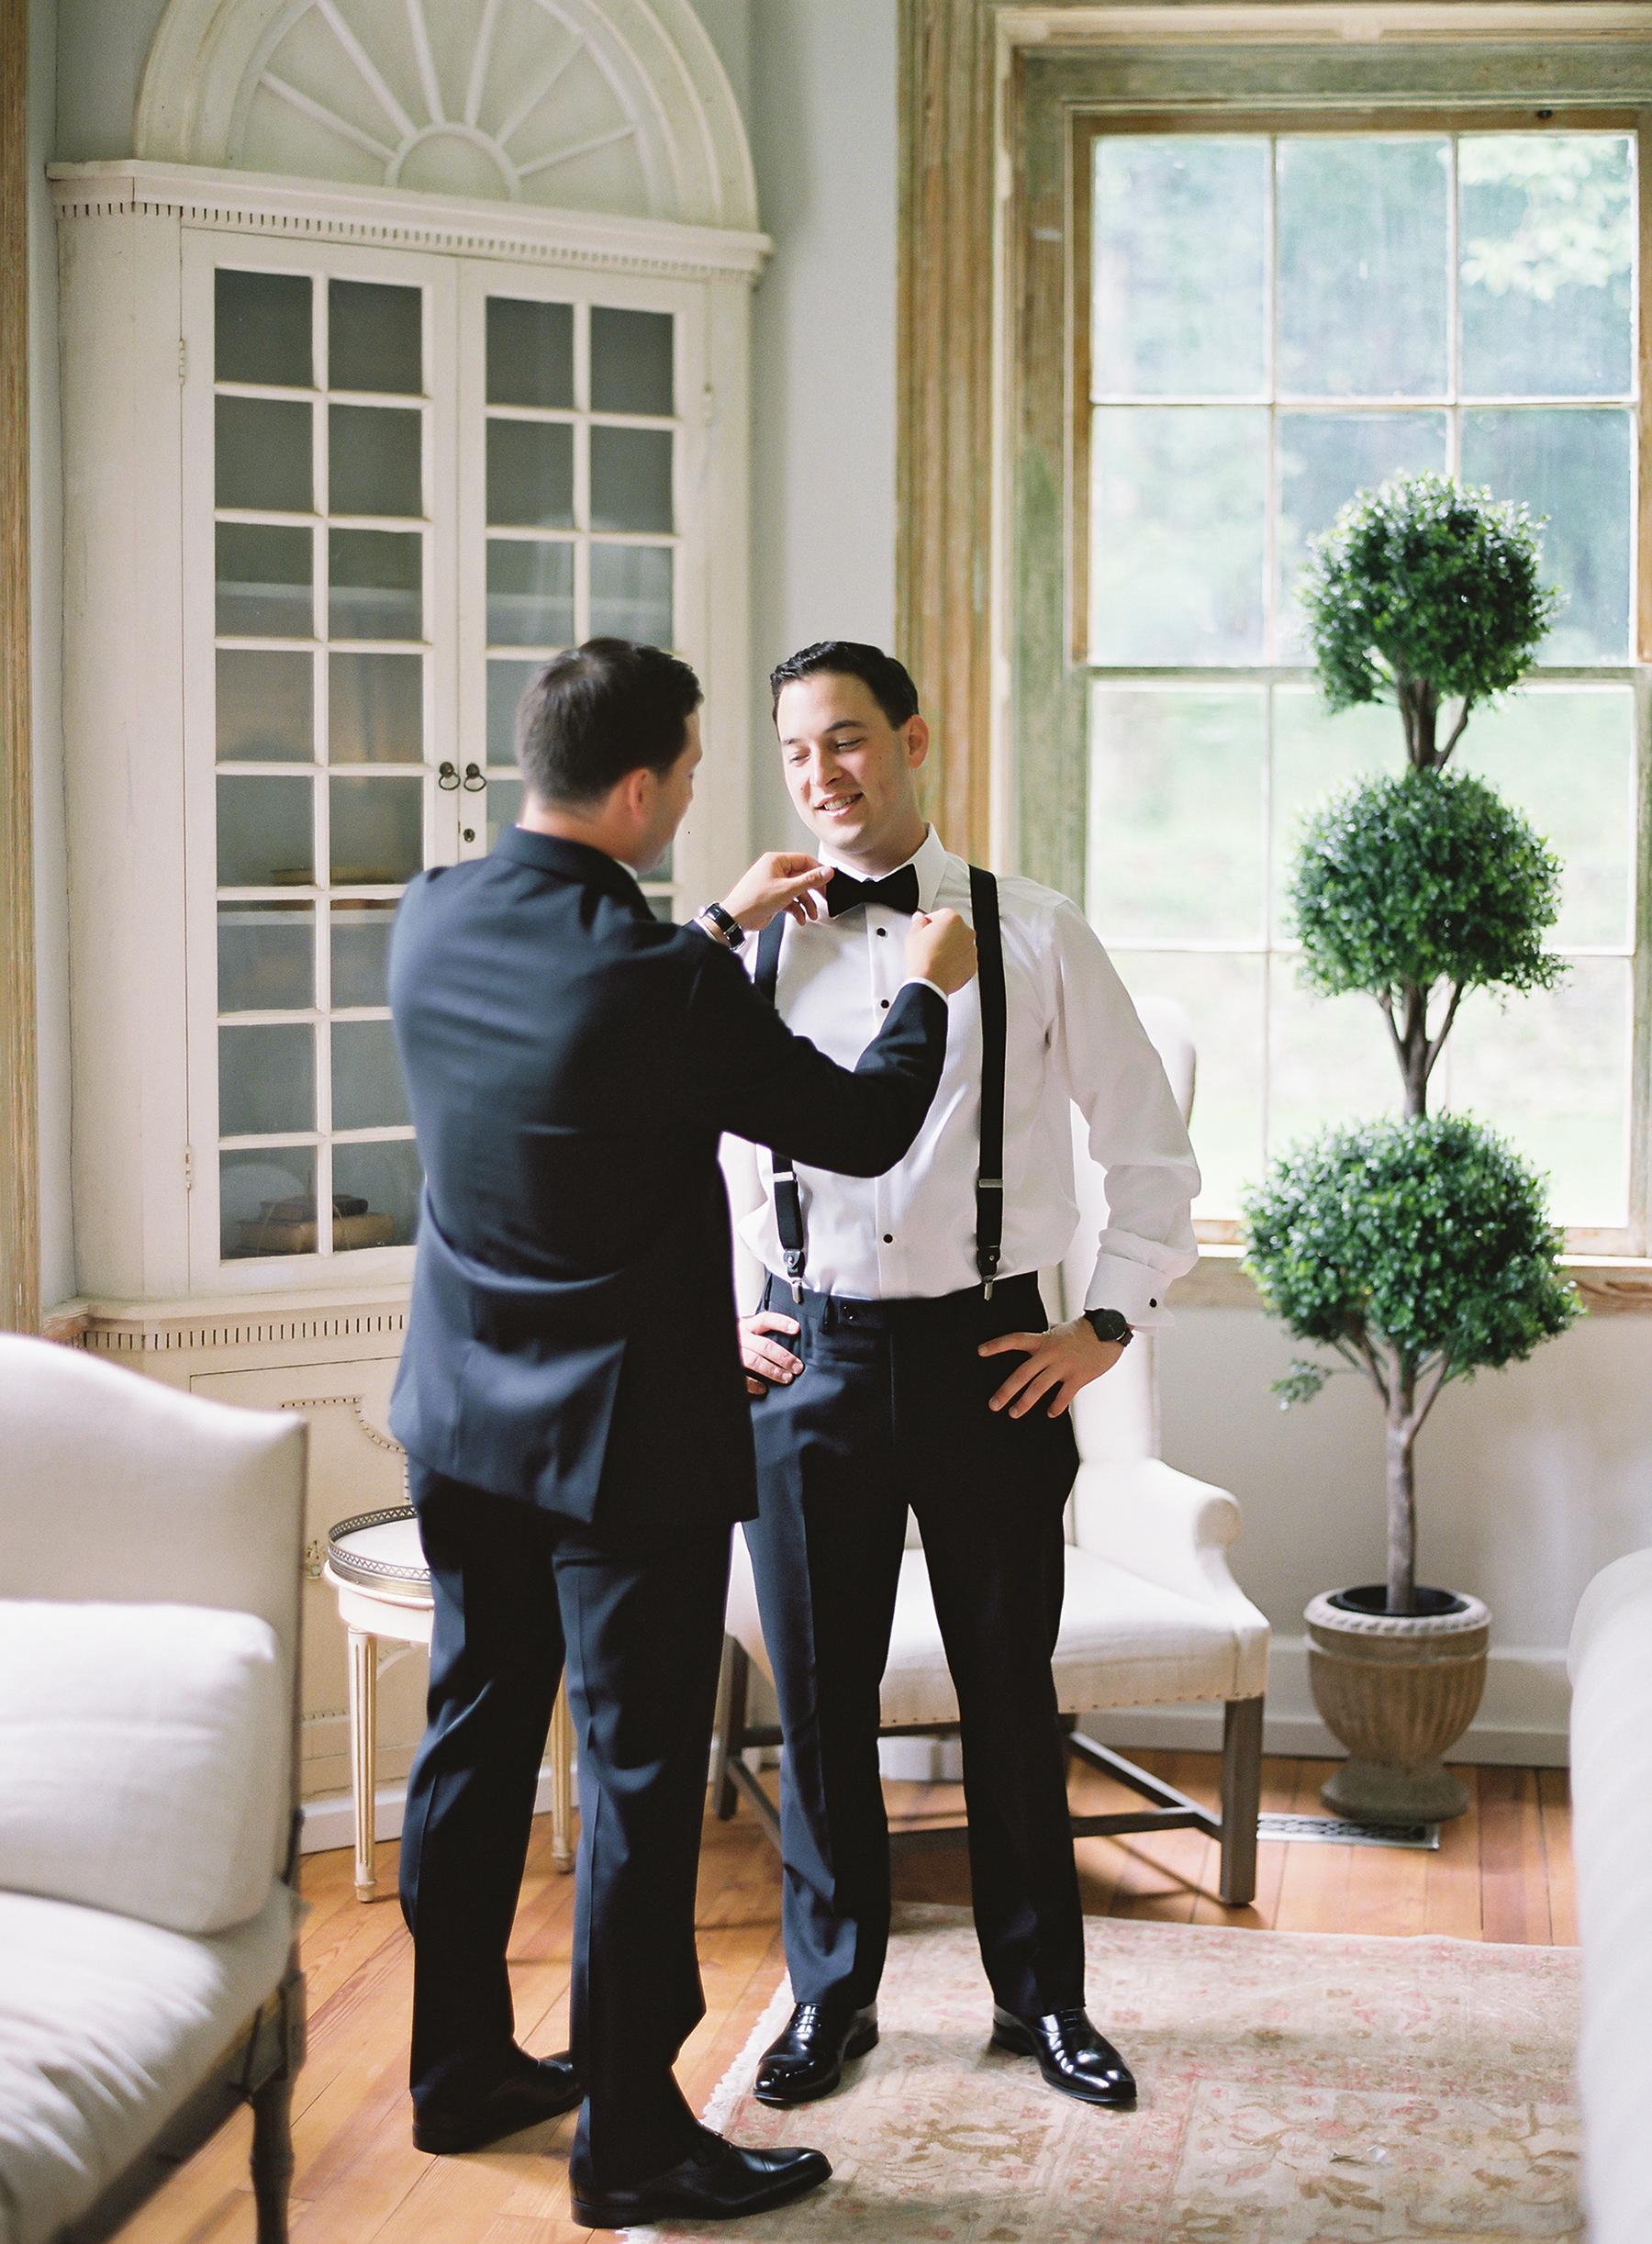 best man helping groom get ready